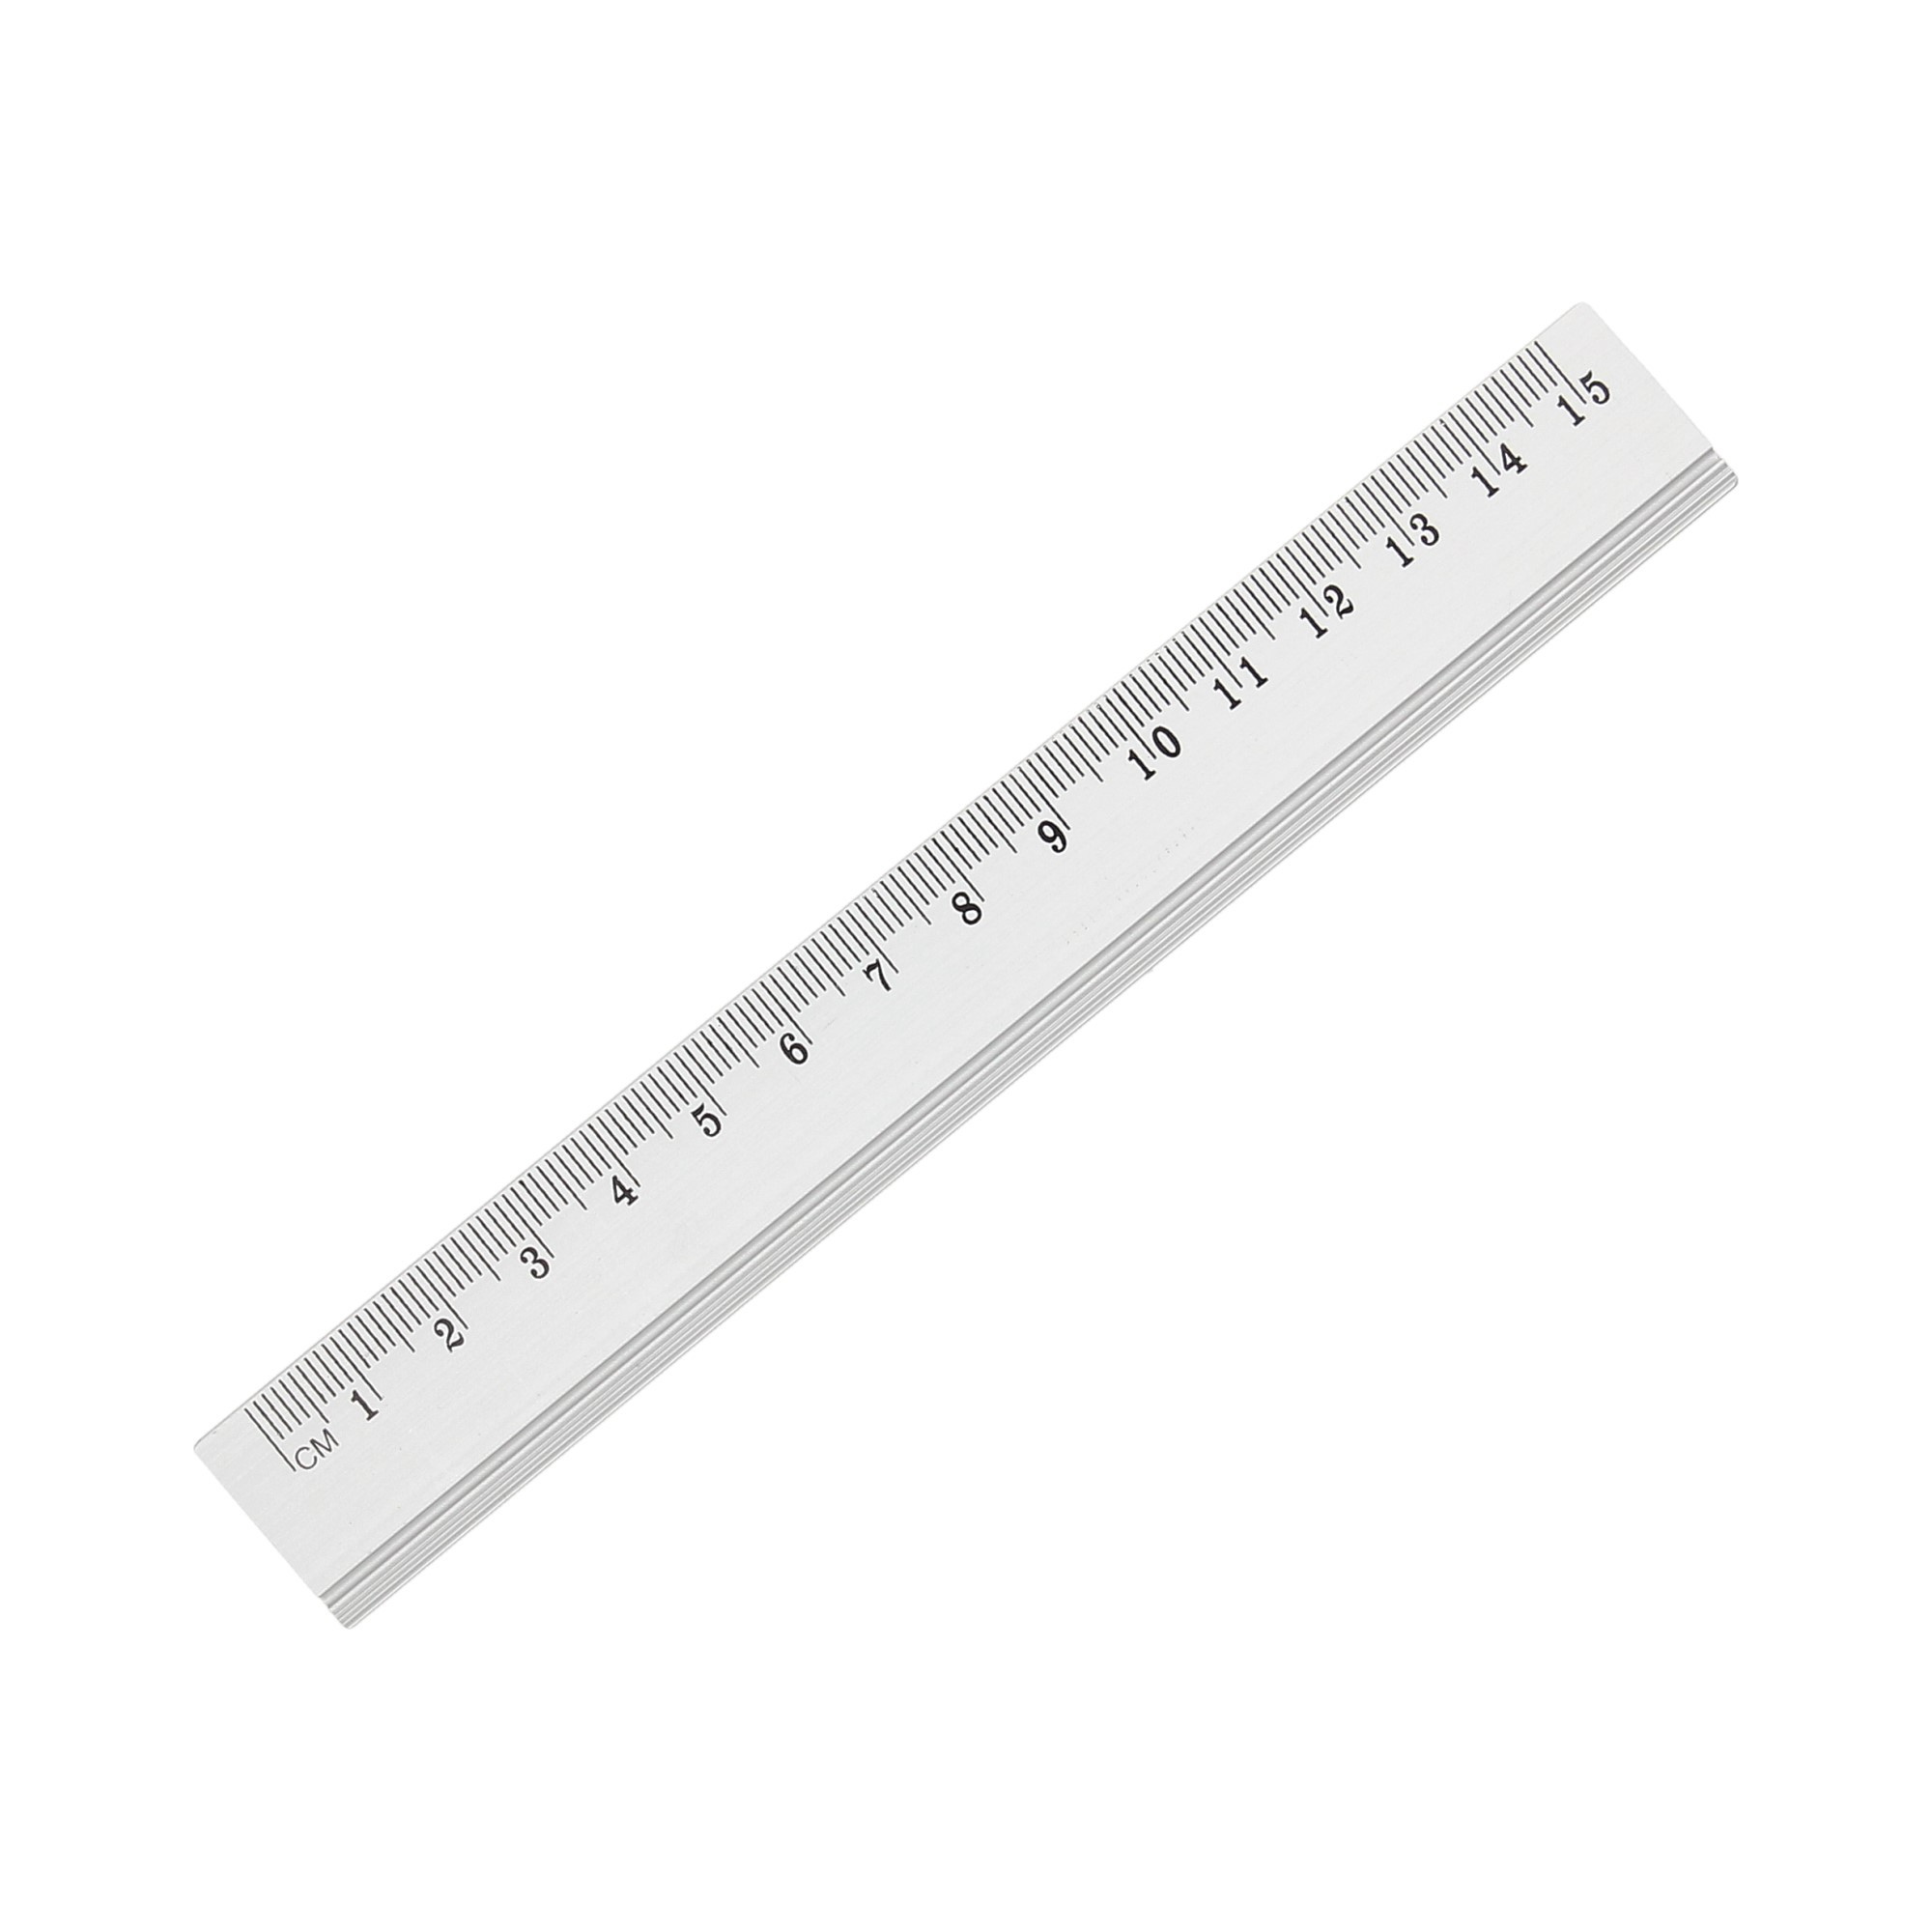 Linijka 15cm aluminium KwTrade GR120-15